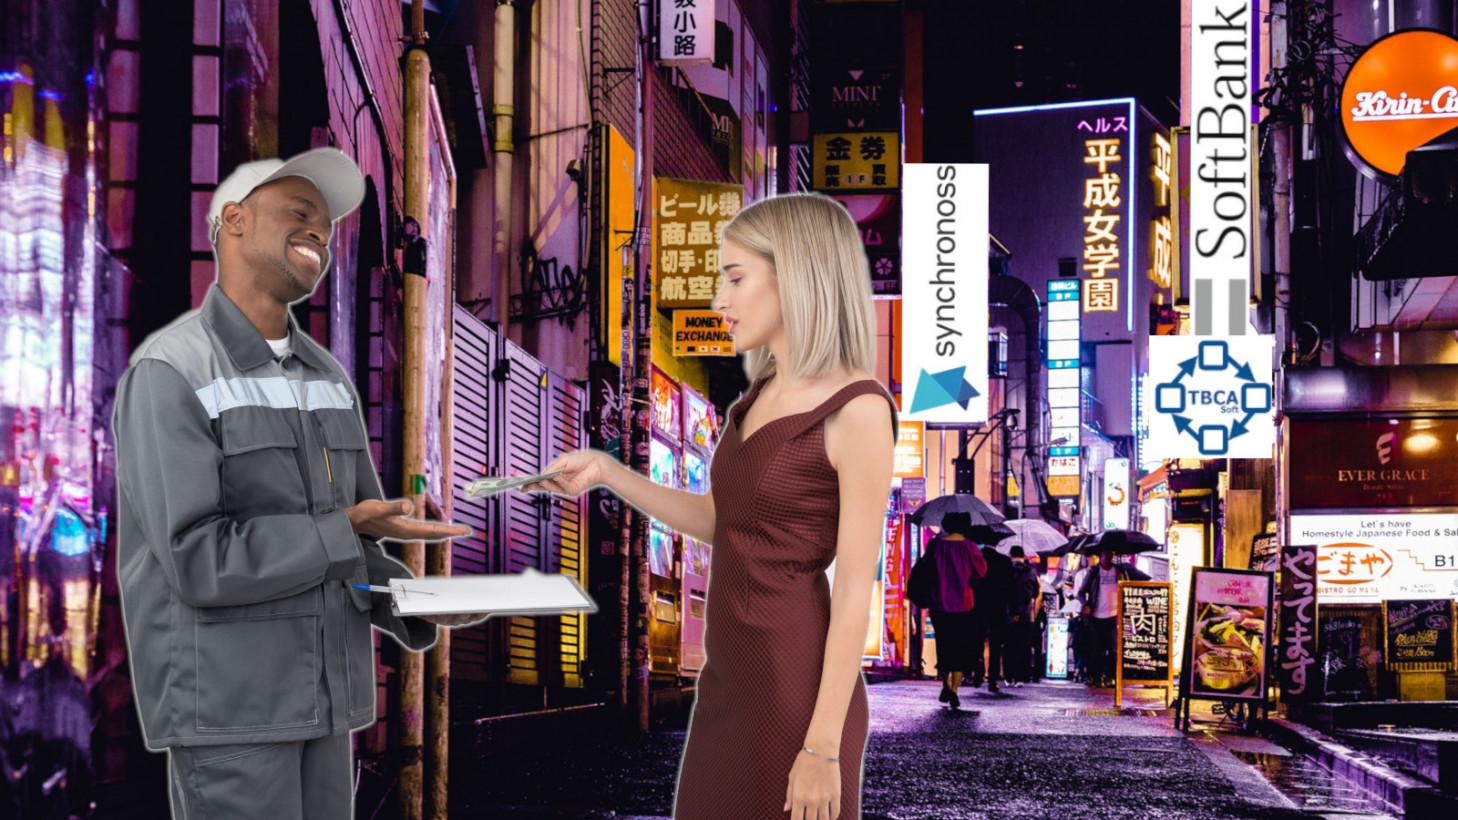 thenextweb.com - Matthew Beedham - SoftBank initiative aims to blockchainify mobile payments across the globe